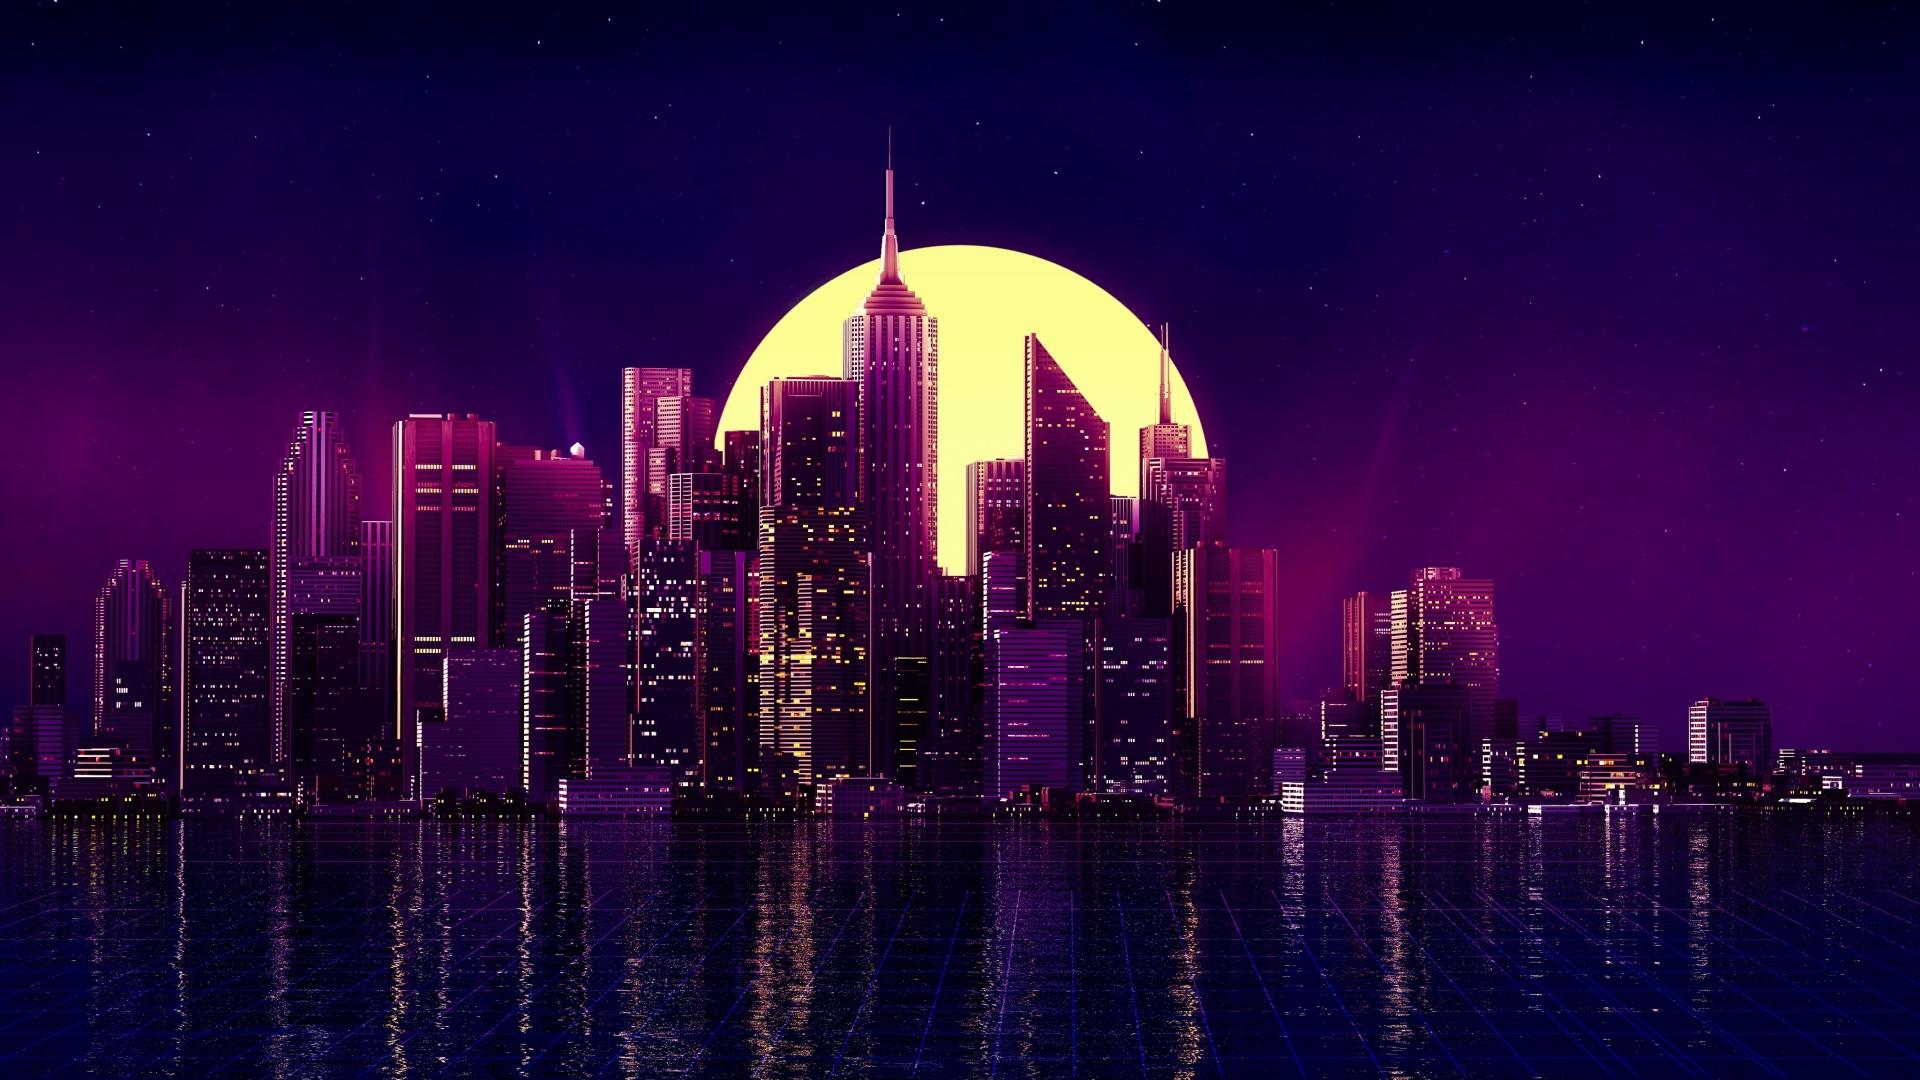 1920x1080 Neon New York City 1080p Laptop Full Hd Wallpaper